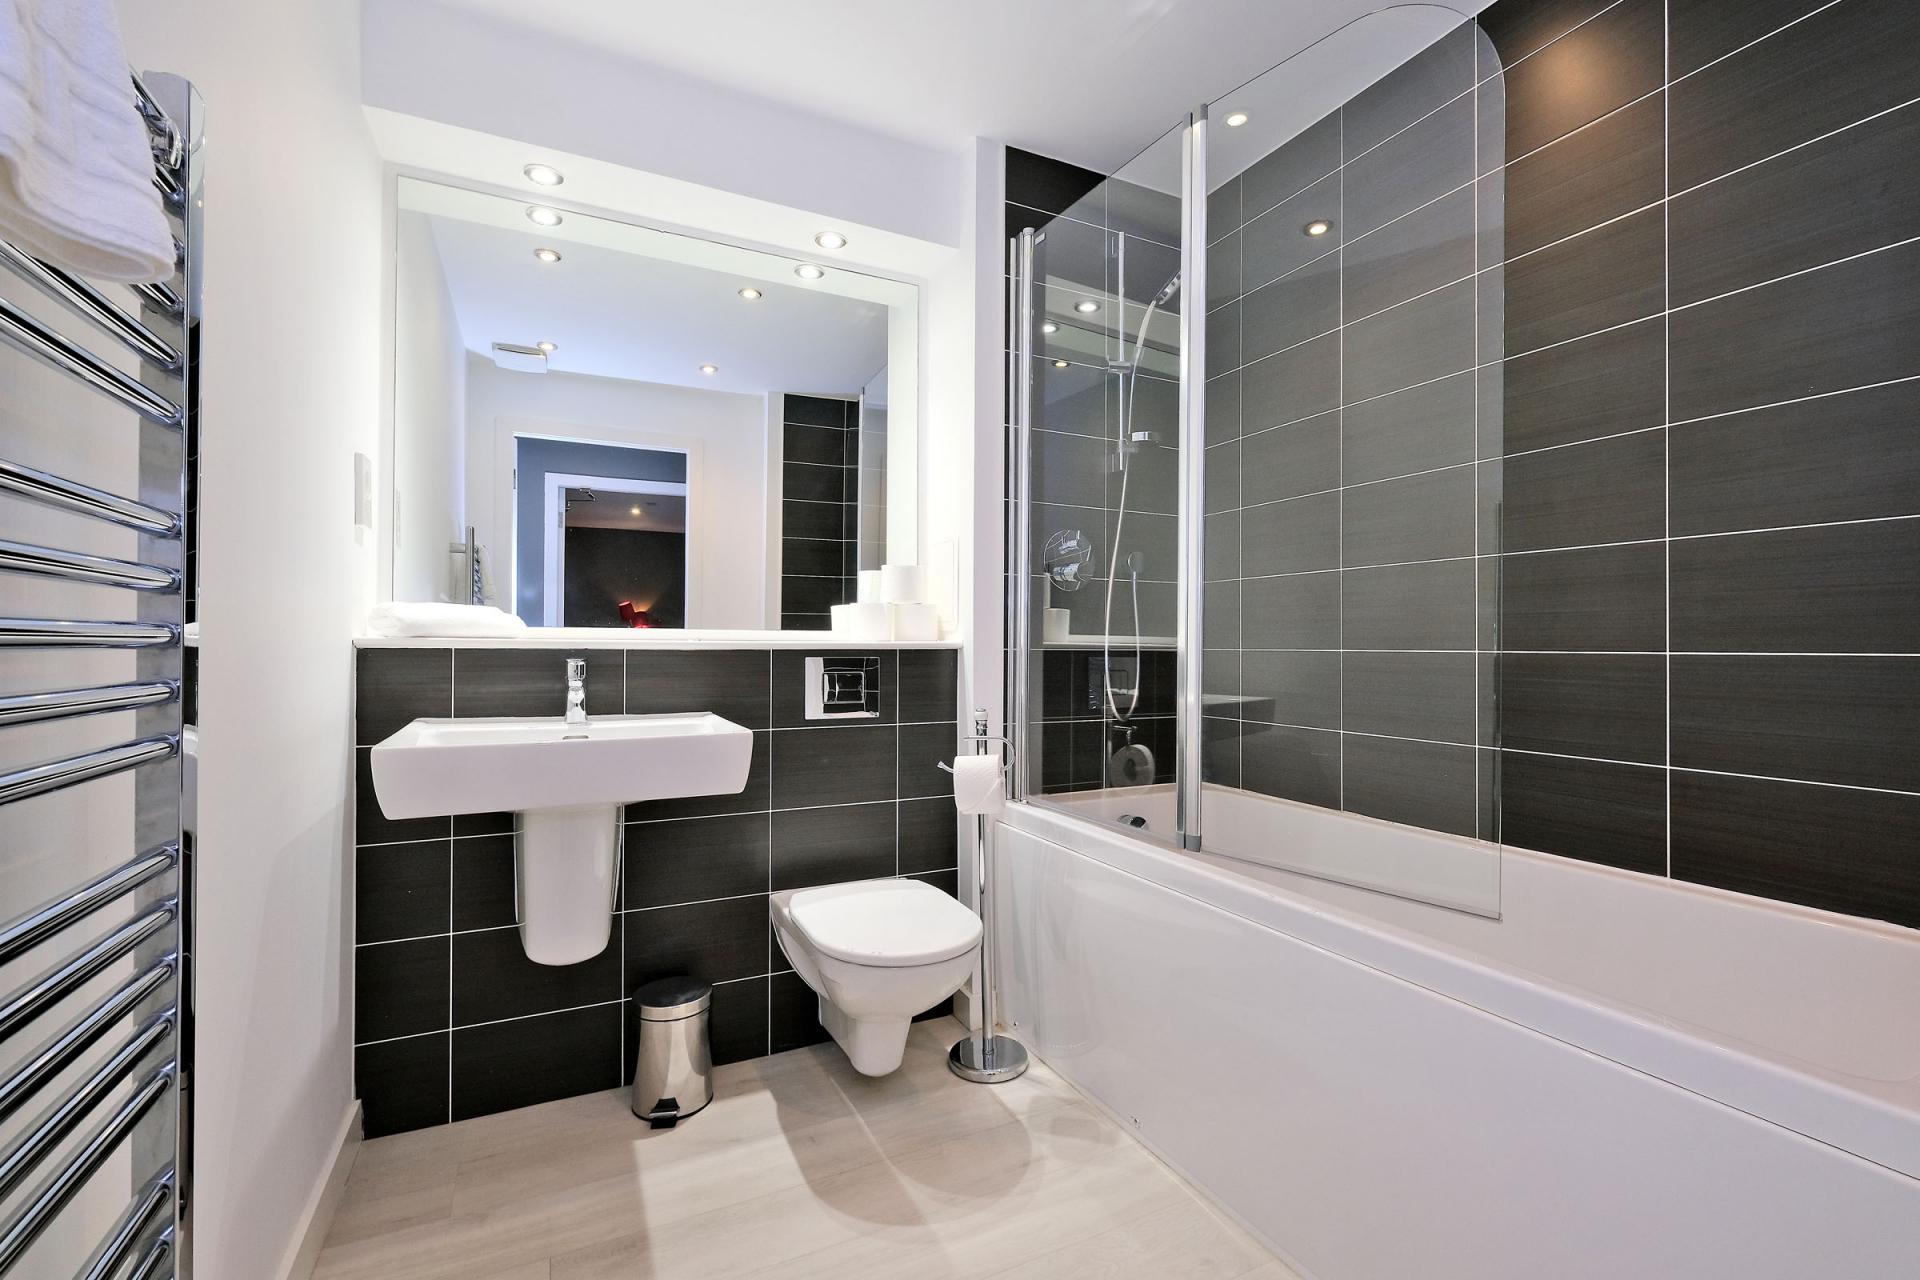 Bathroom at 54 Chapel Street Apartments, Centre, Aberdeen - Citybase Apartments